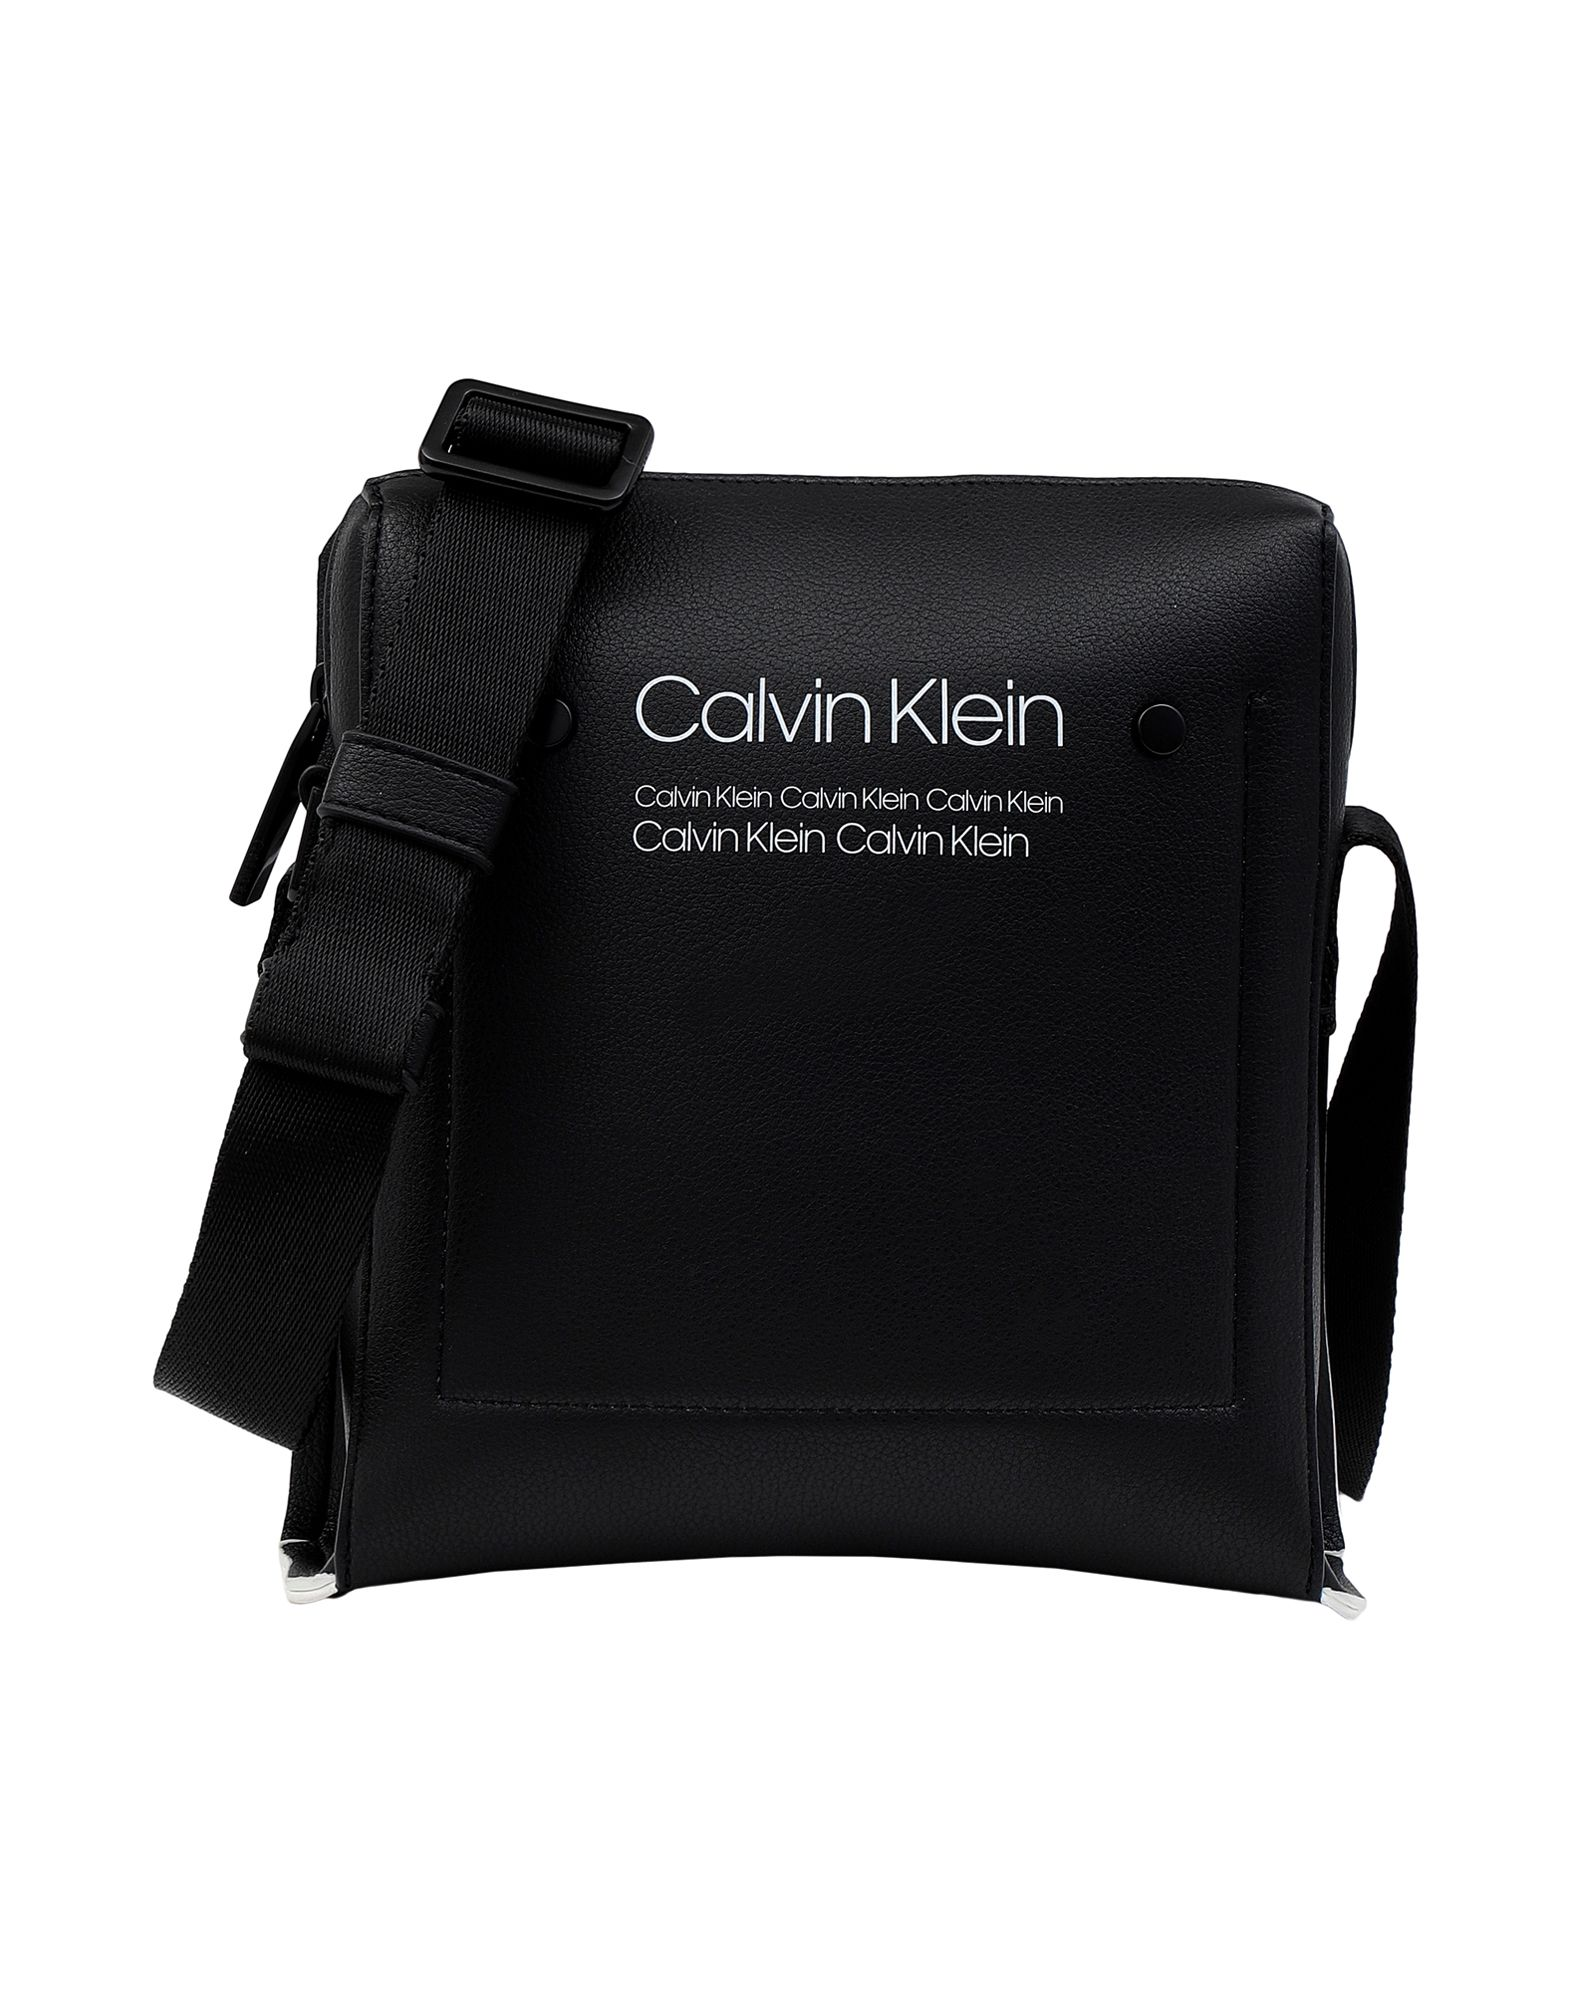 CALVIN KLEIN Сумка через плечо сумка мессенджер ecco ely